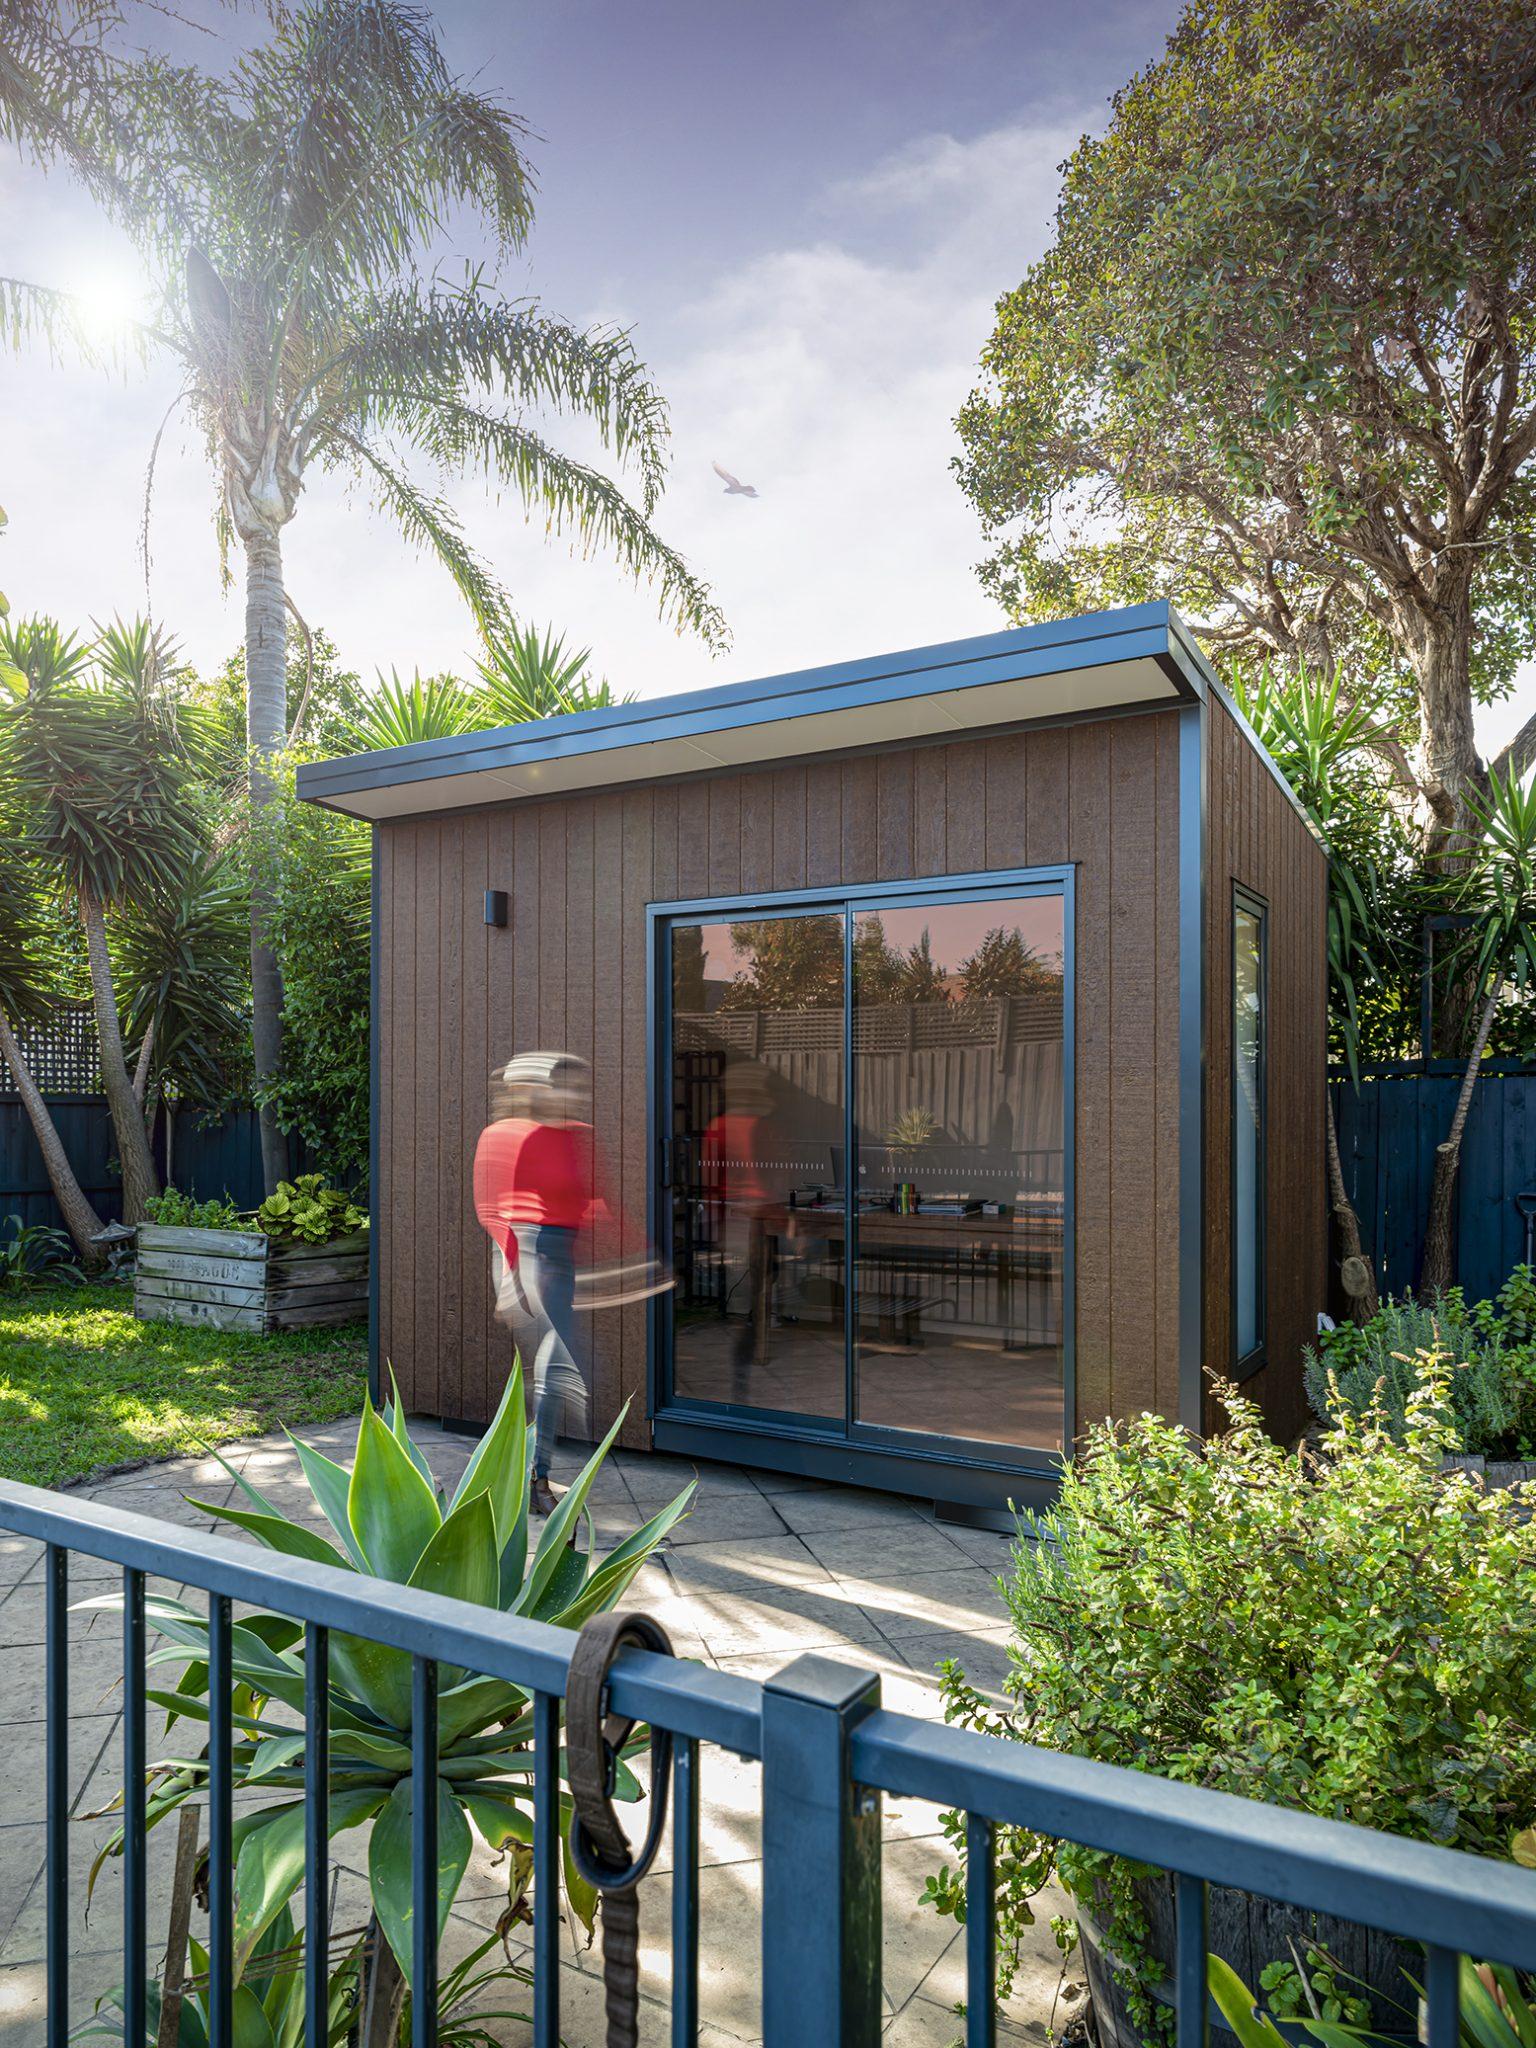 Standard Calatrava Studio